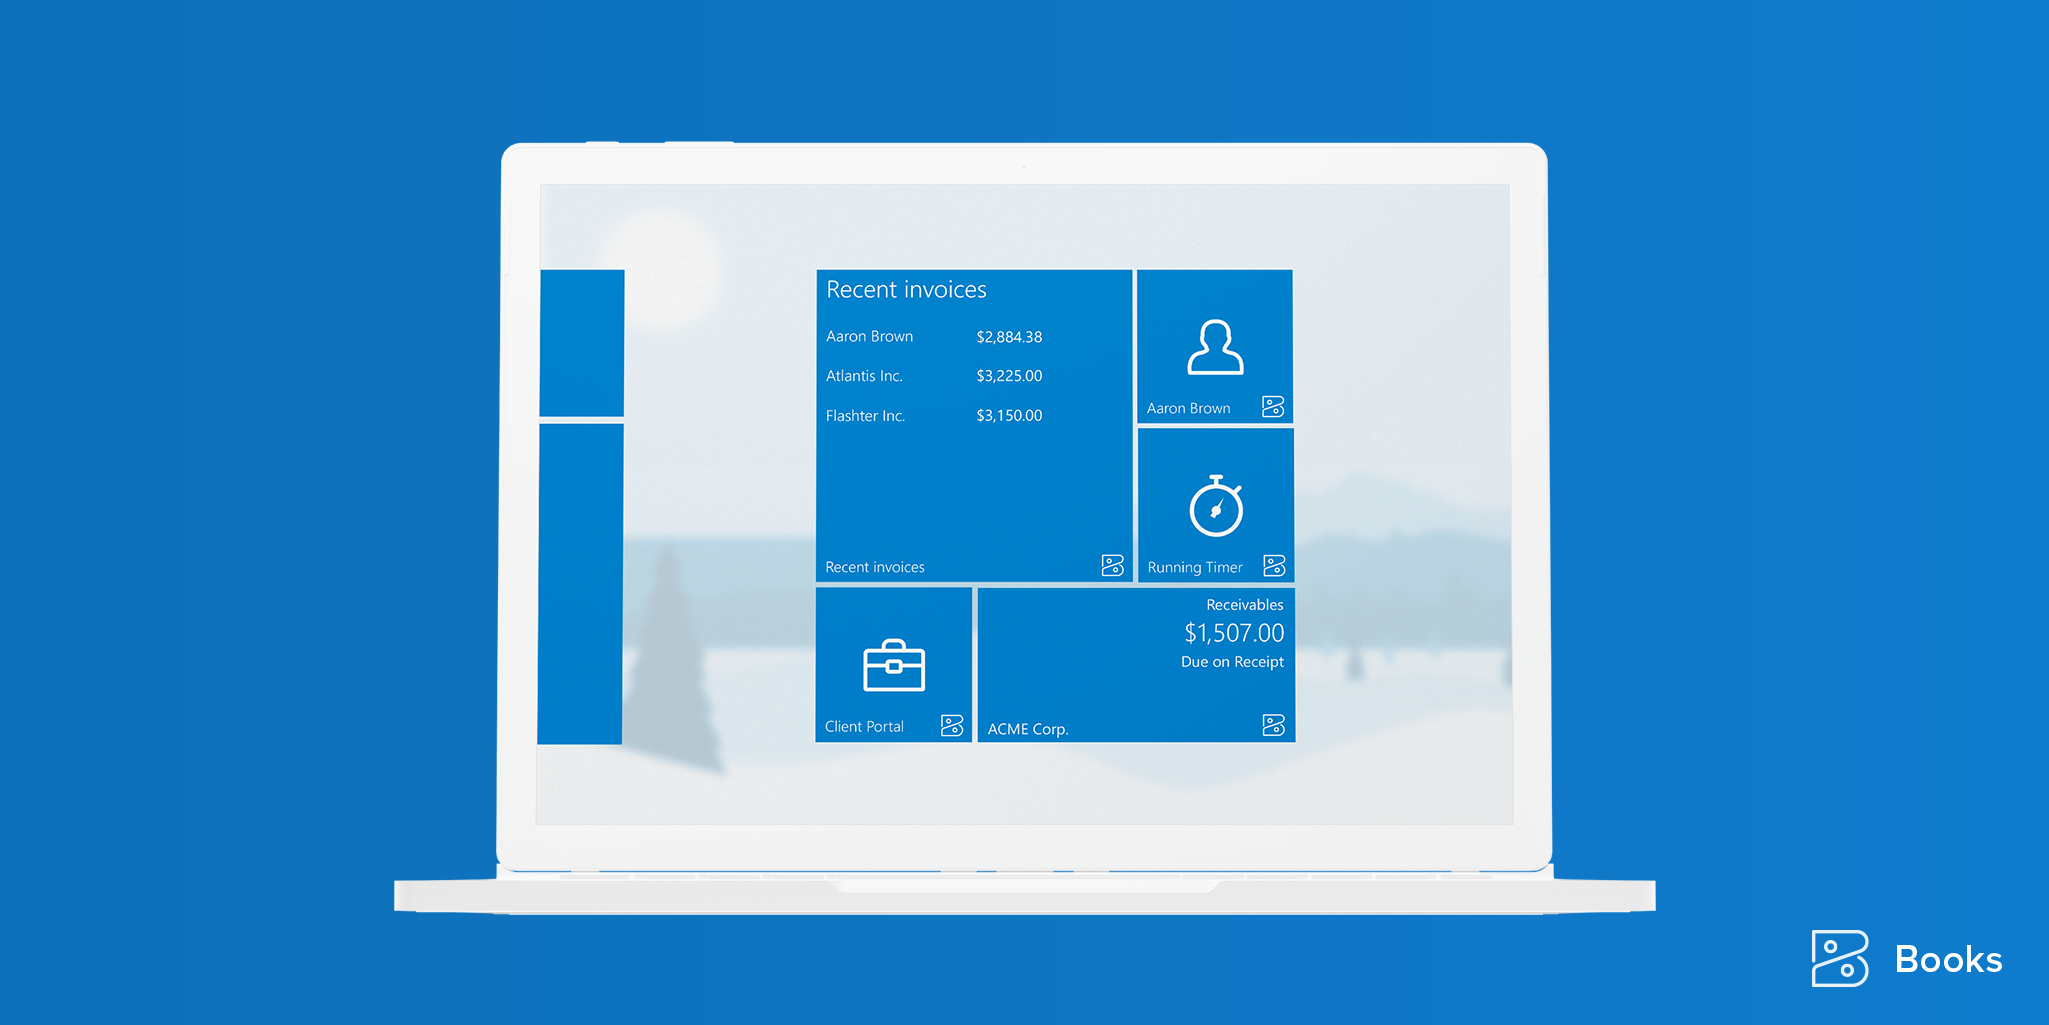 Zoho Books Windows app Live Tiles